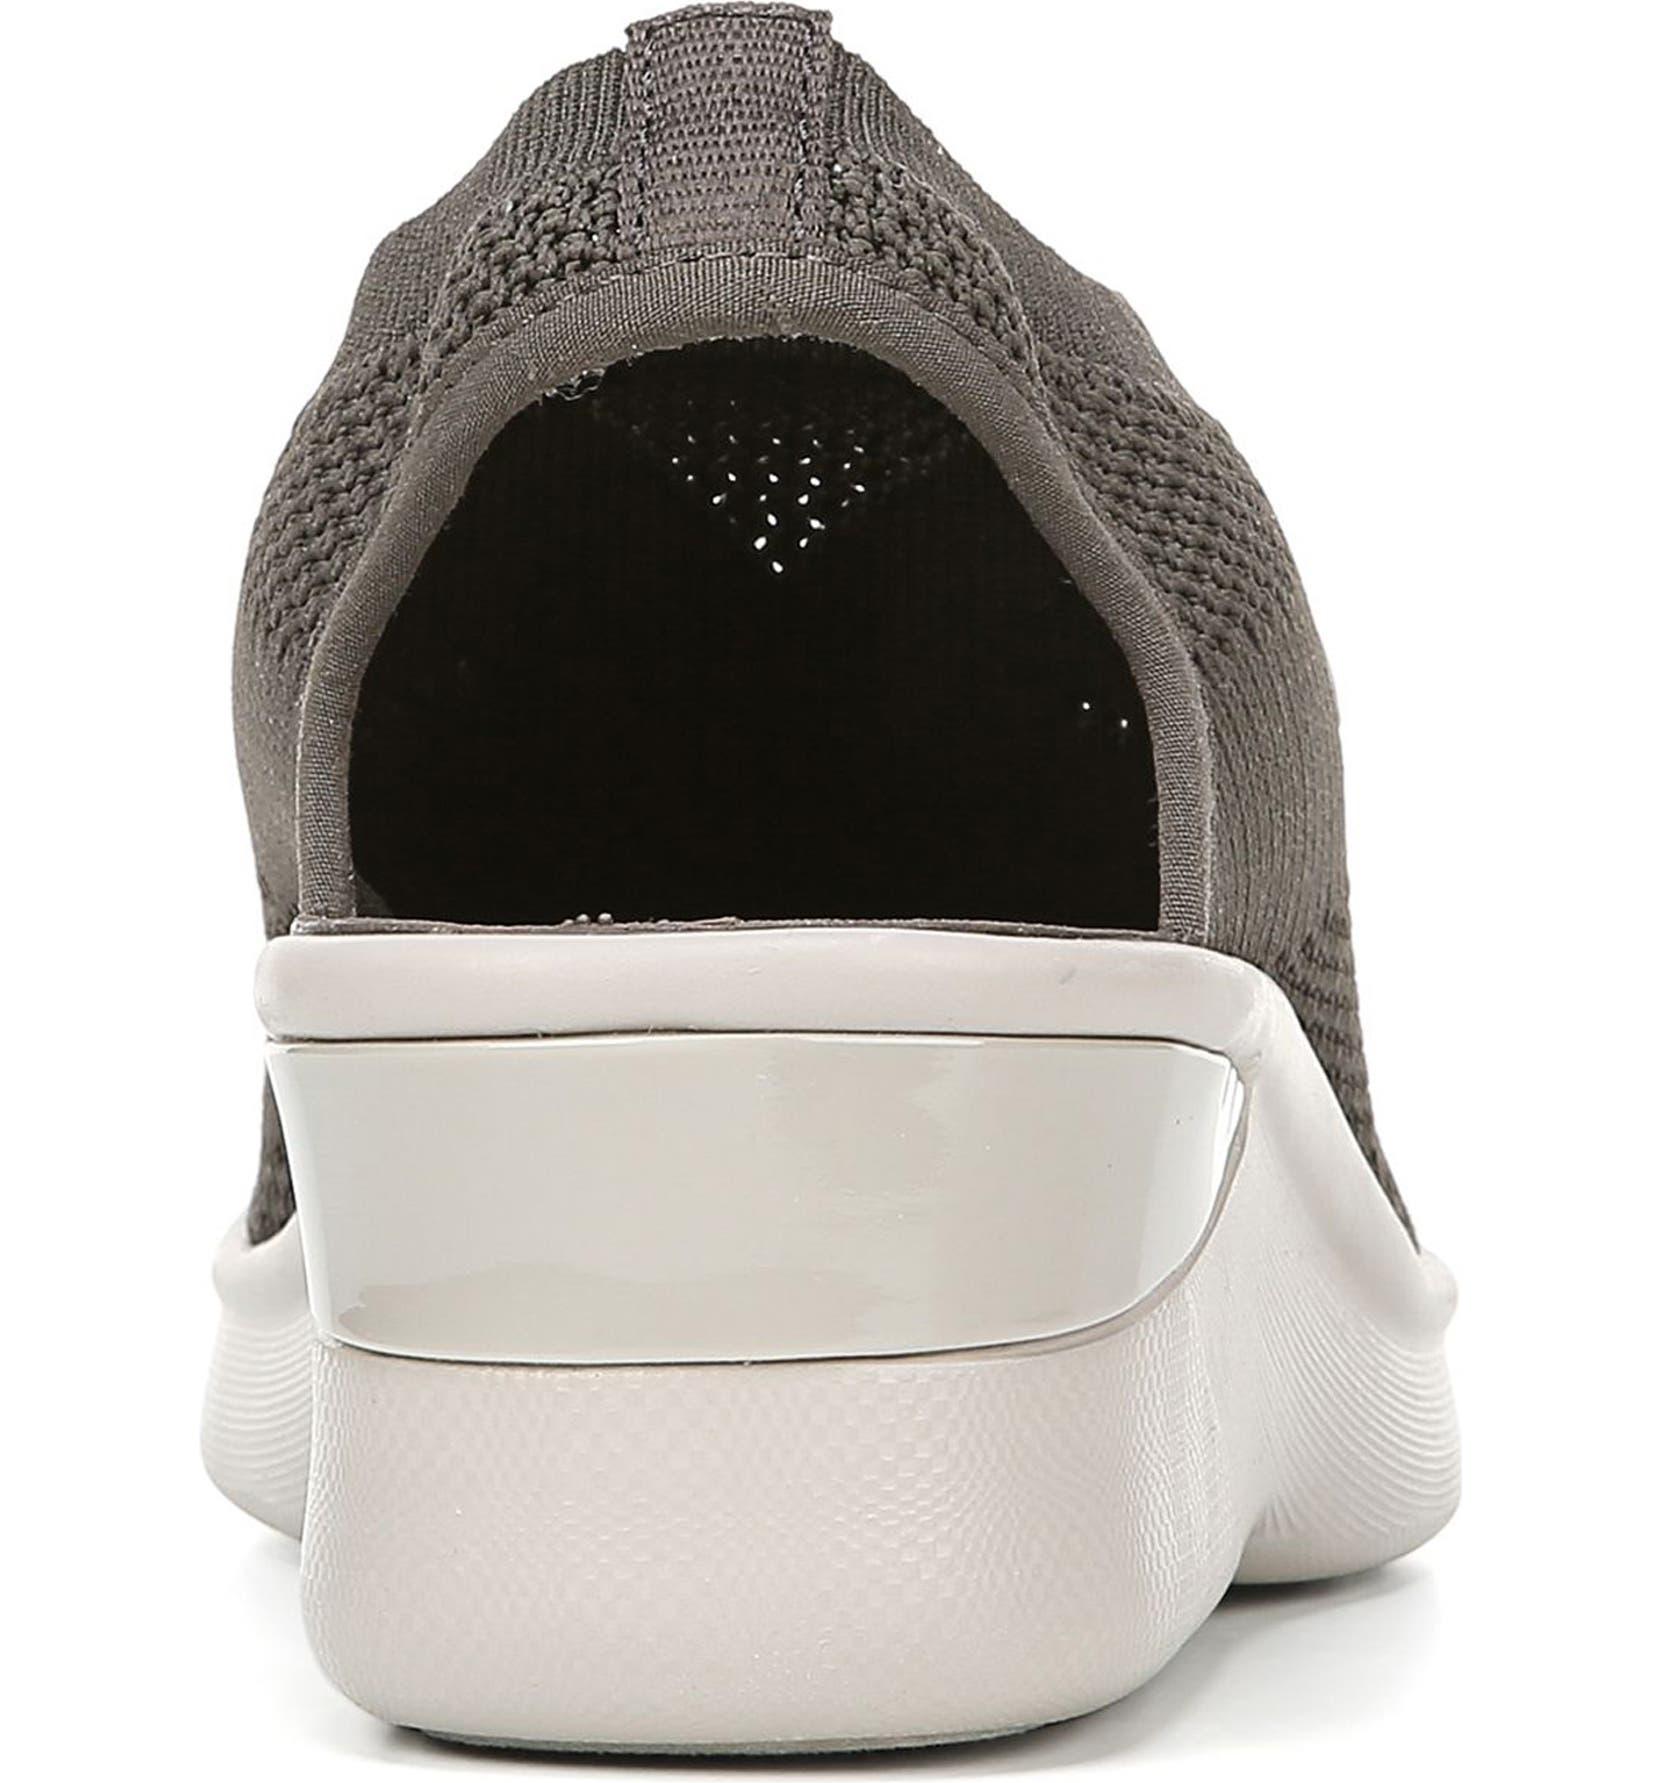 a4ce9d9e6b5b BZees Secret Peep Toe Knit Sneaker (Women)